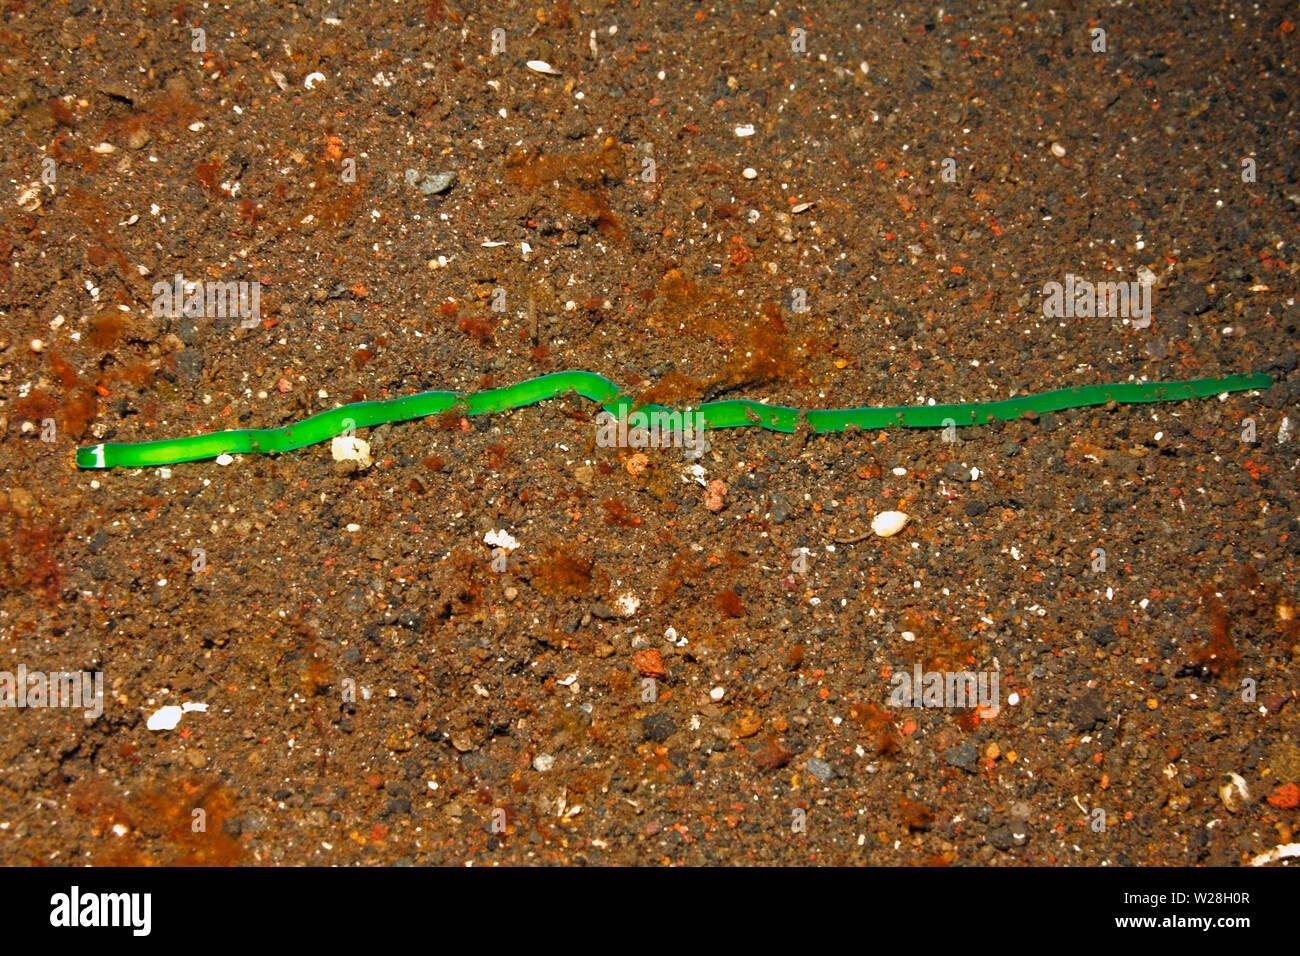 green-ribbon-worm-notospermus-sp-tulamben-bali-indonesia-bali-sea-indian-ocean-W28H0R.jpg